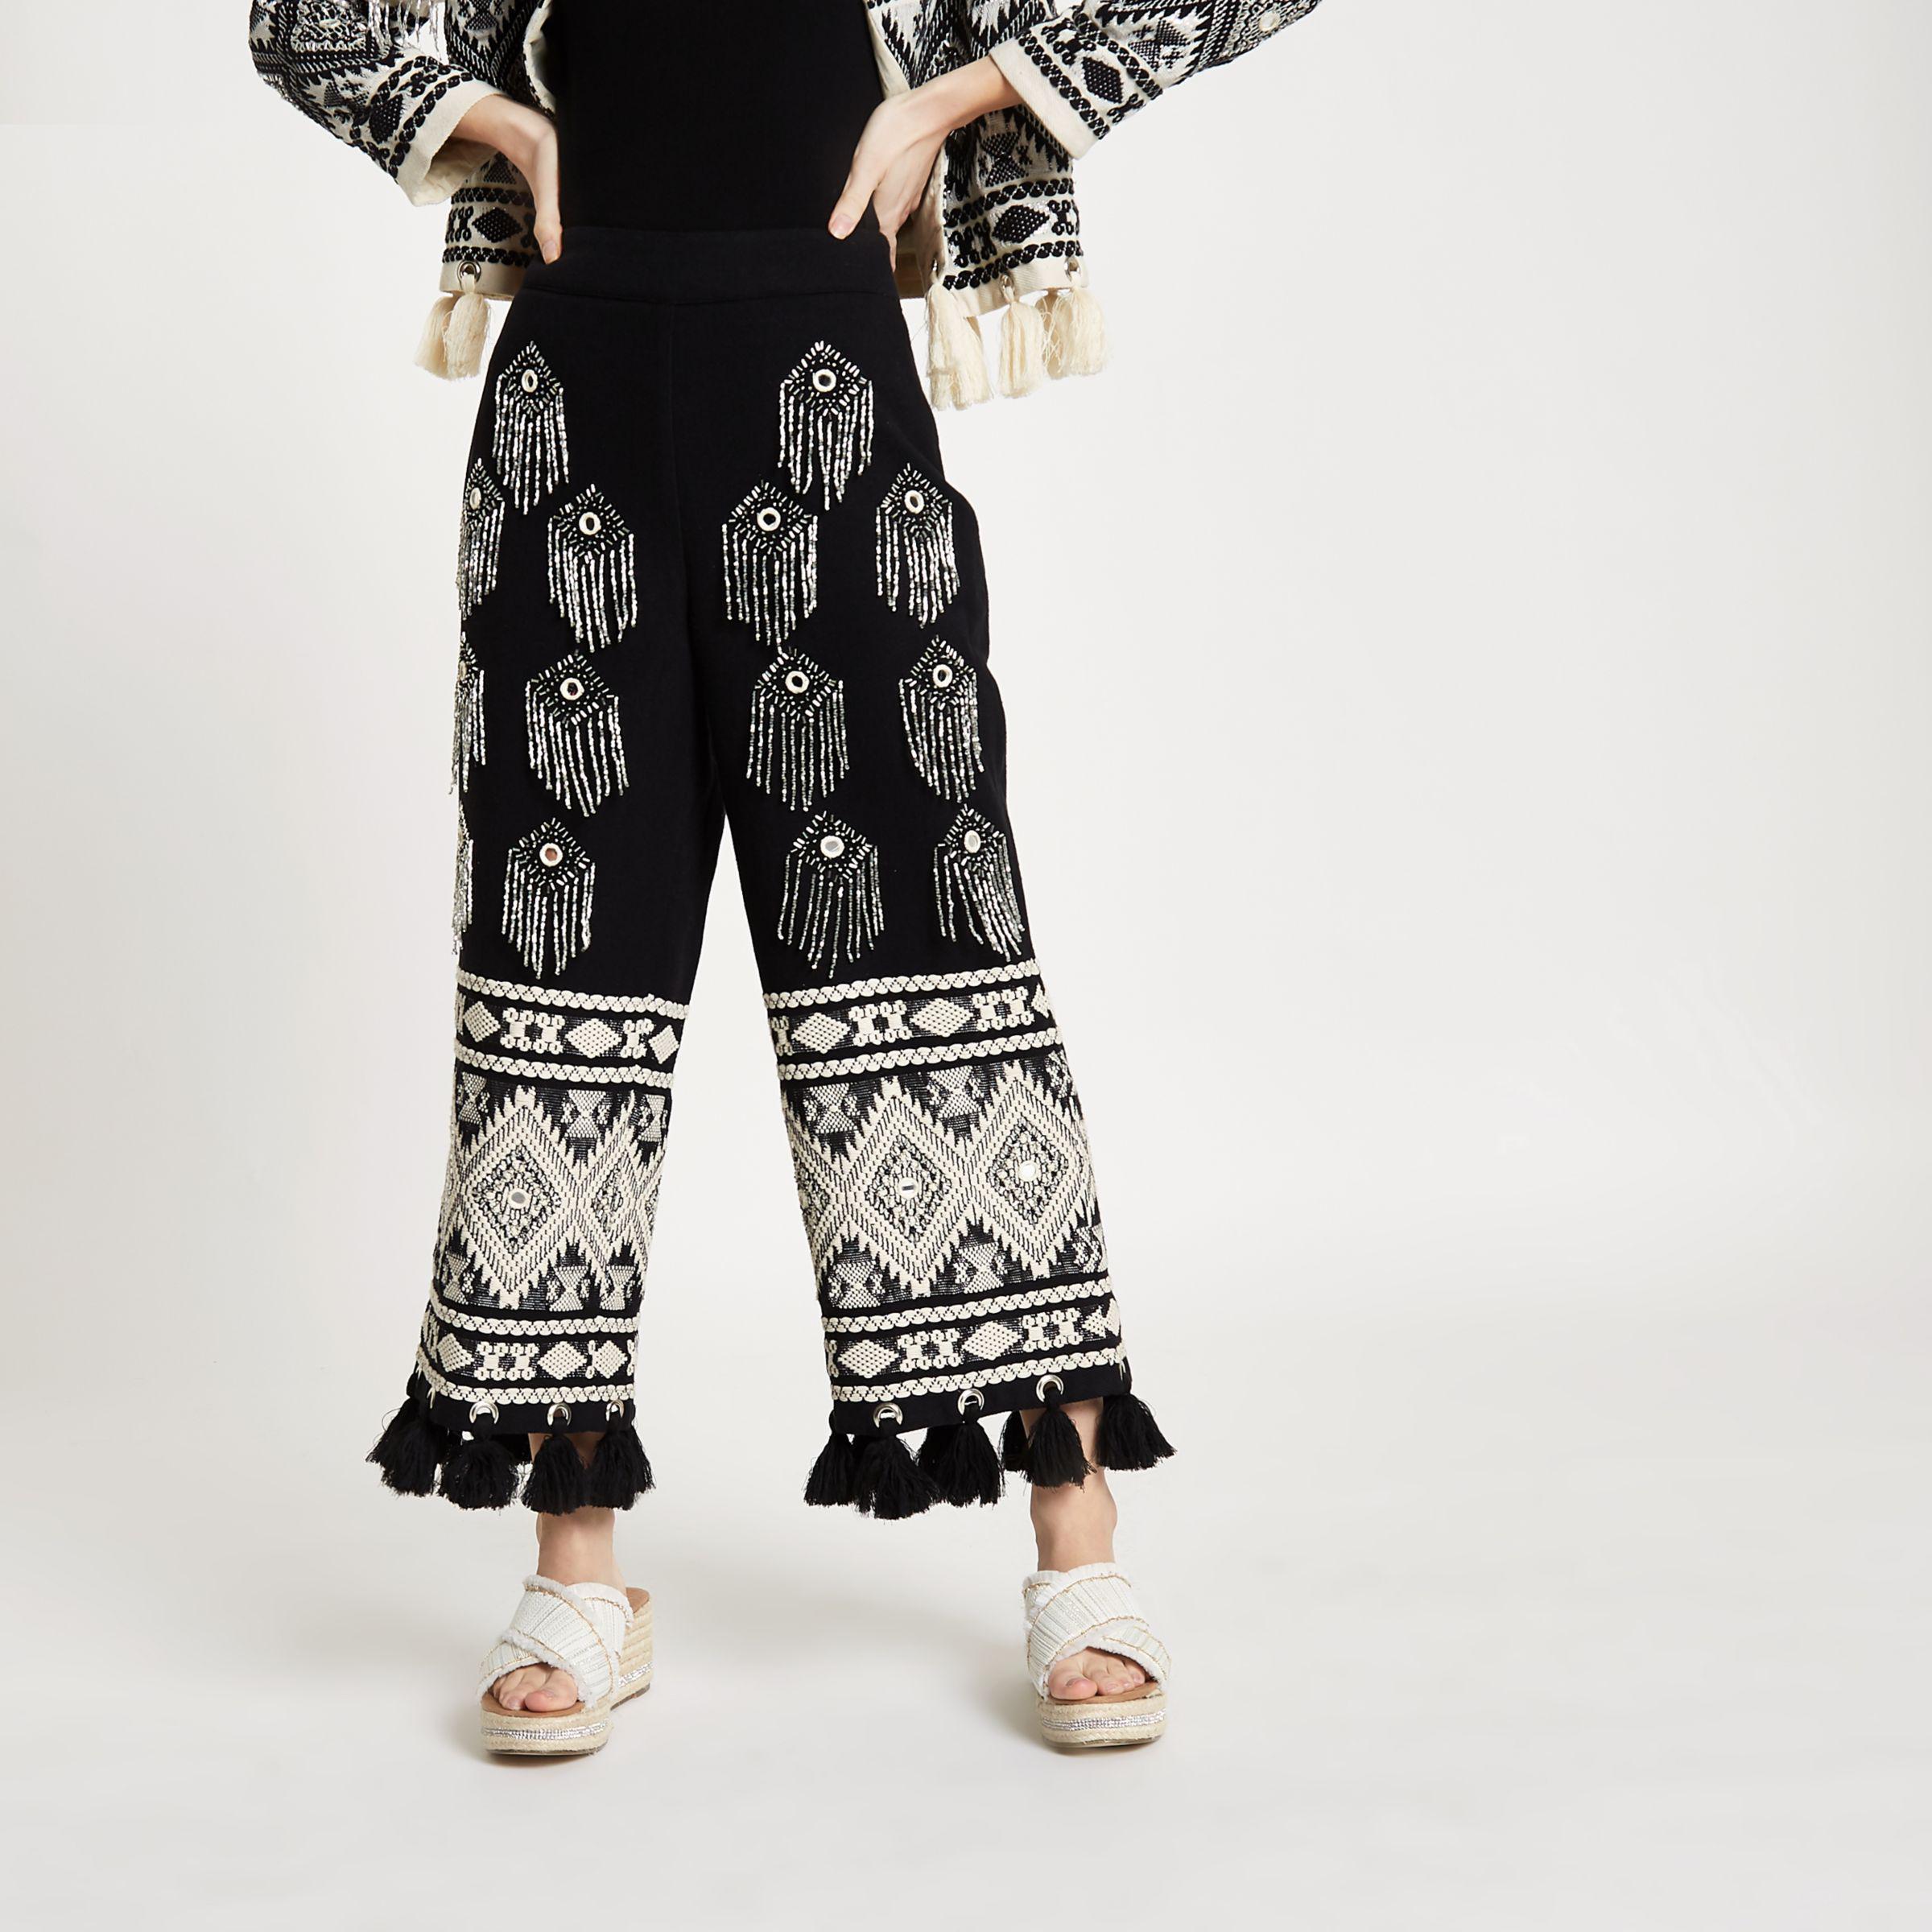 Free Shipping Big Sale Womens Black embellished tassel hem culottes River Island Super p5rvIbH